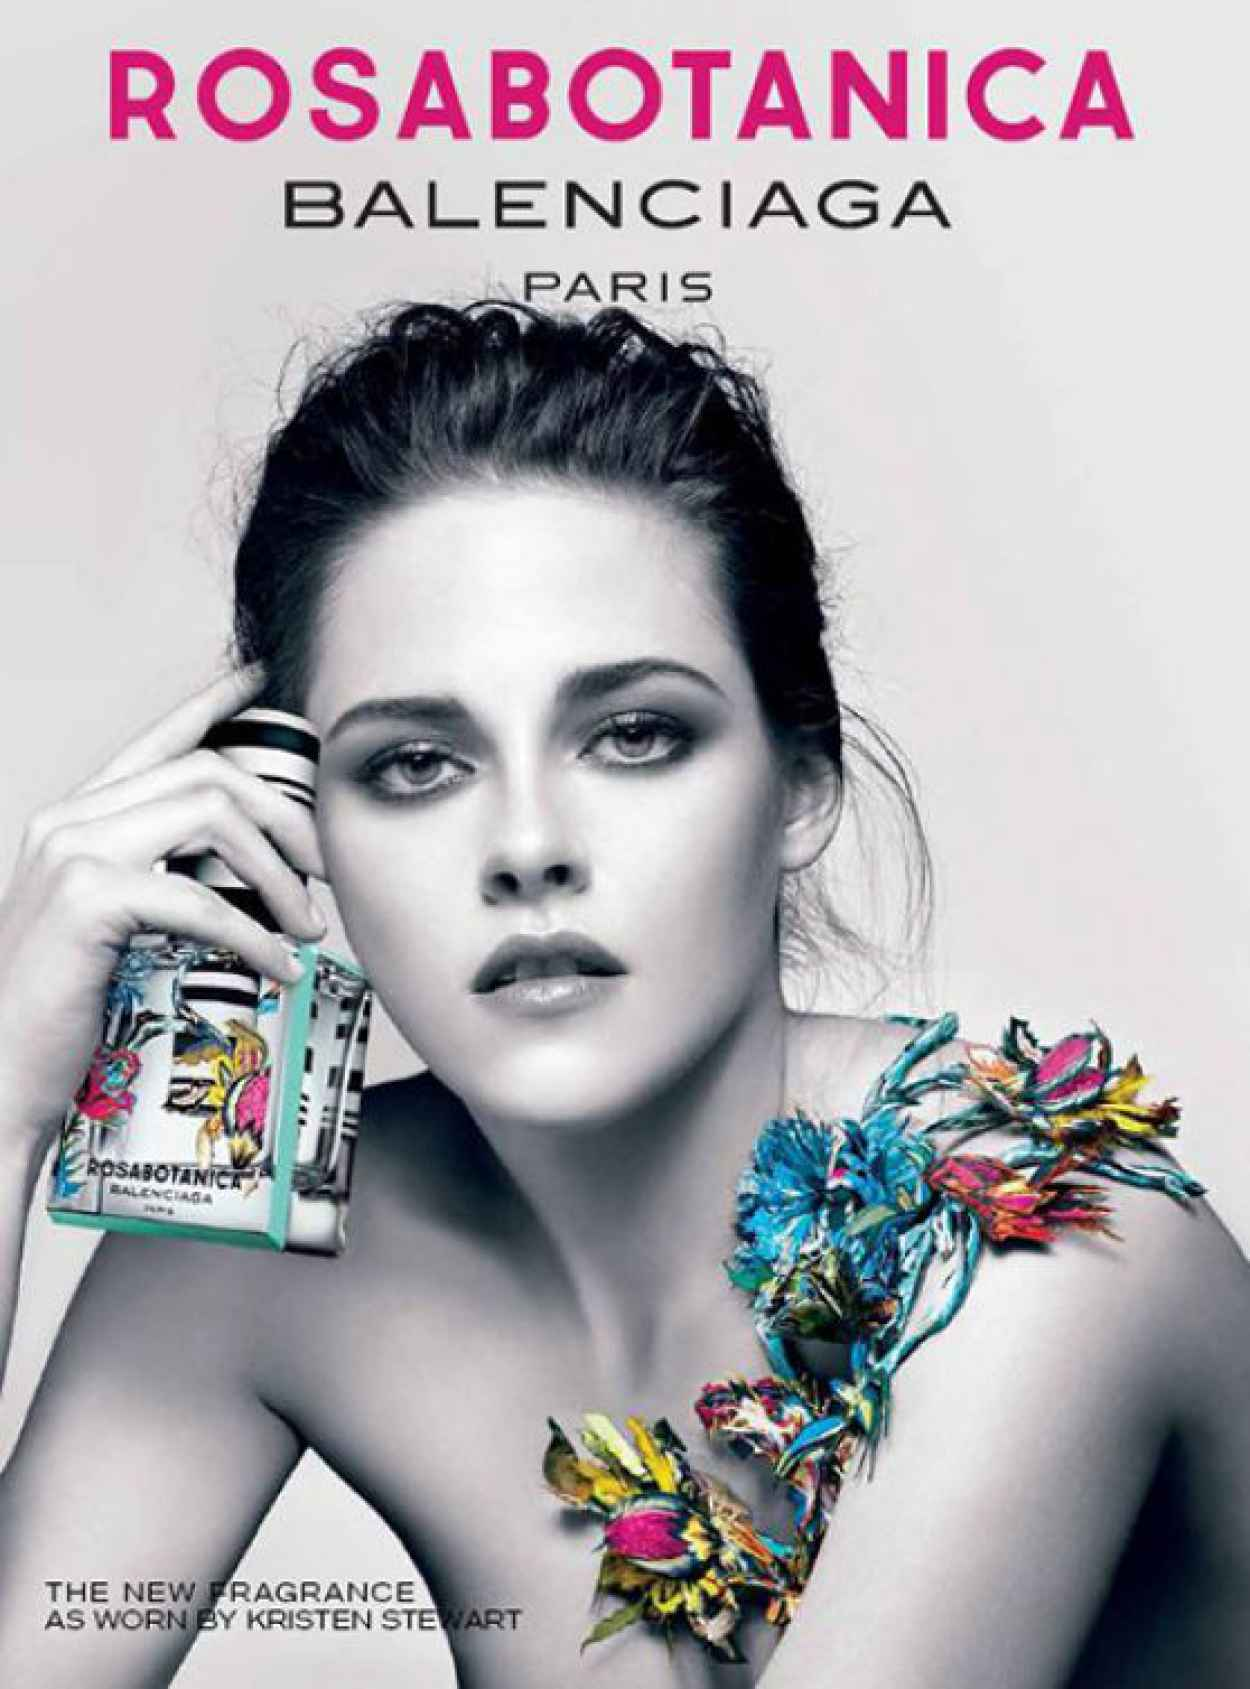 Kristen Stewart - Promoshoot for Florabotanica Balenciaga Fragrance-1